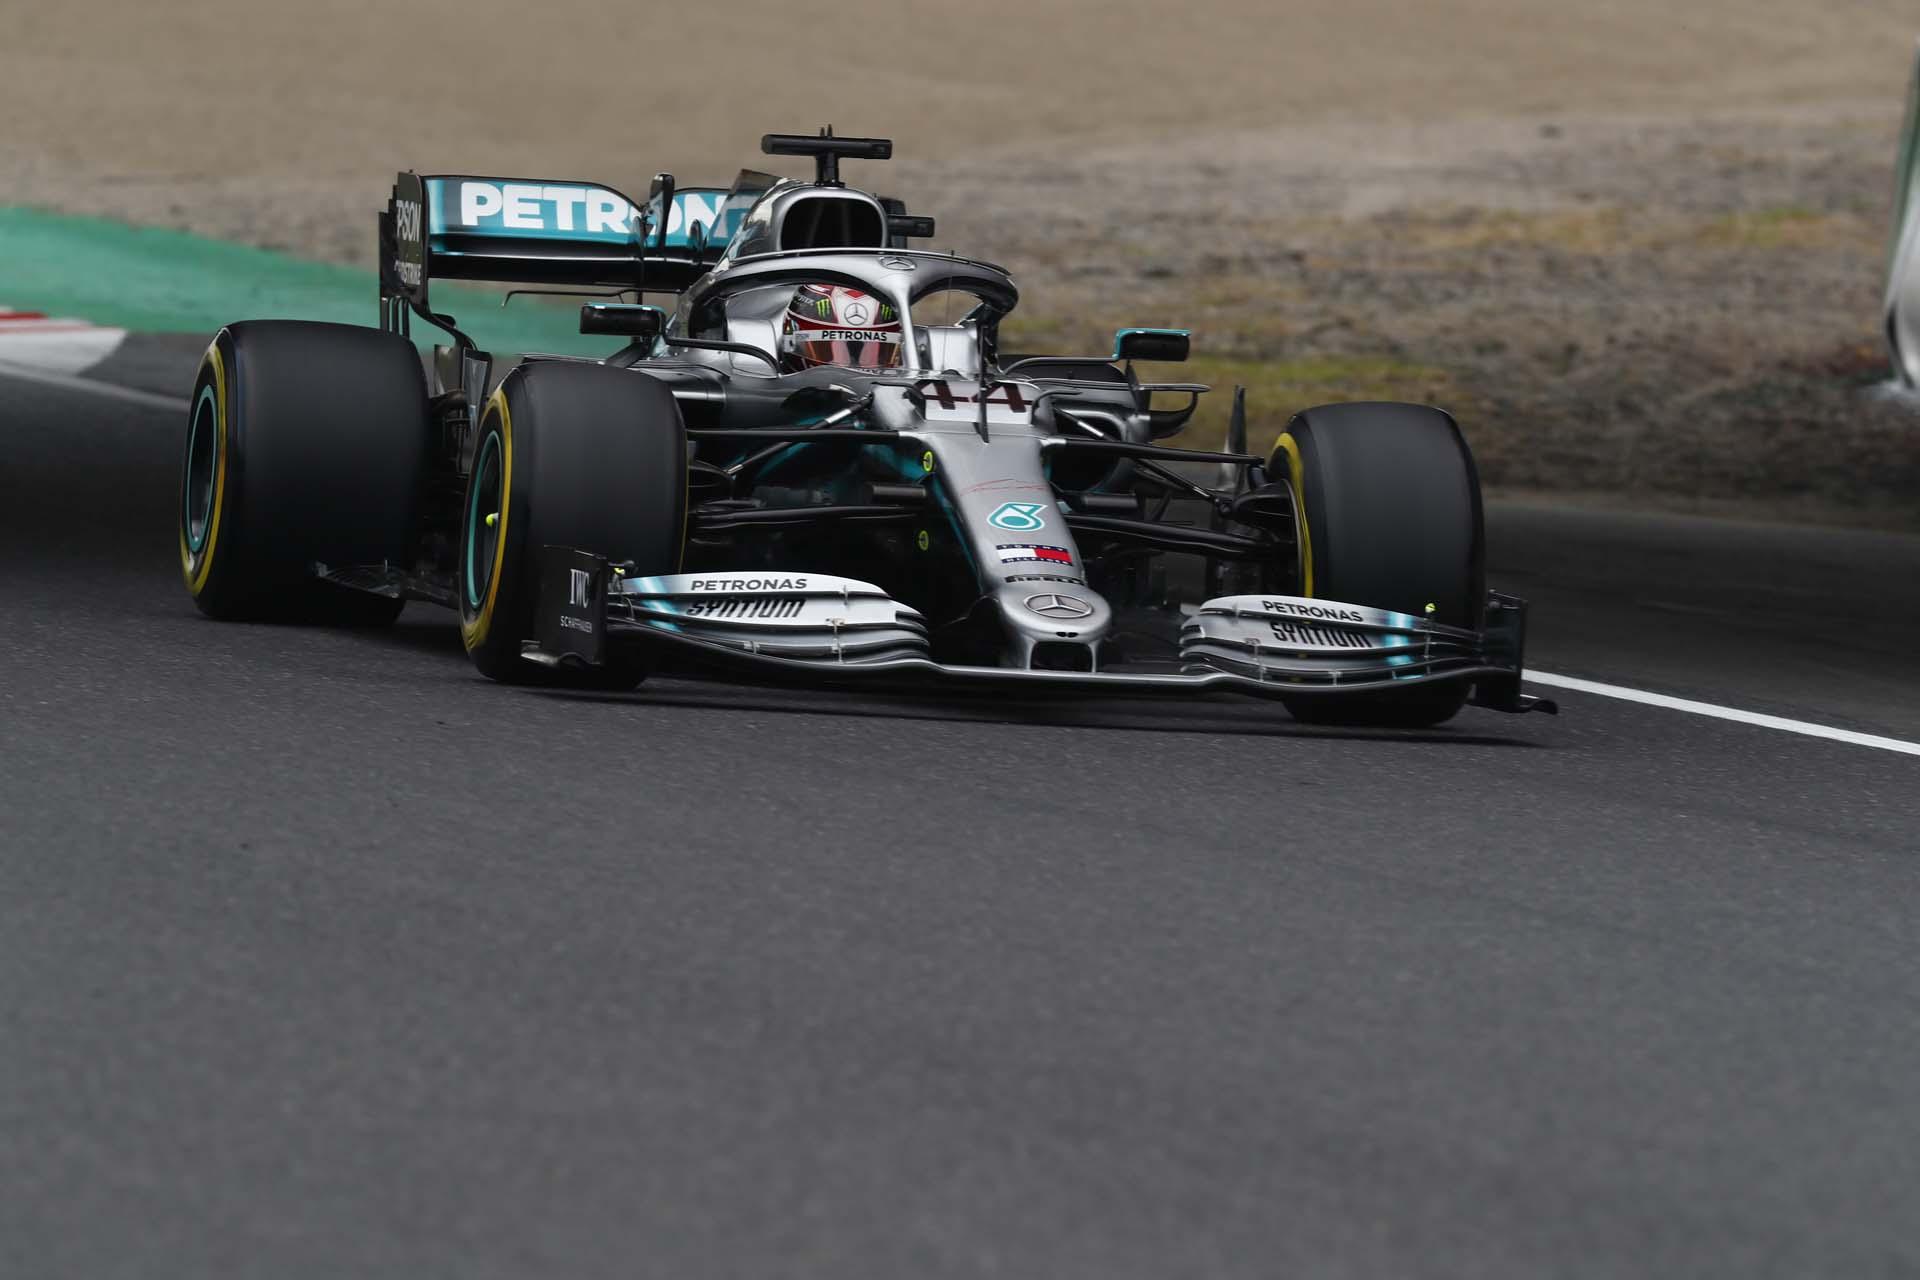 2019 Japanese Grand Prix, Friday - Wolfgang Wilhelm